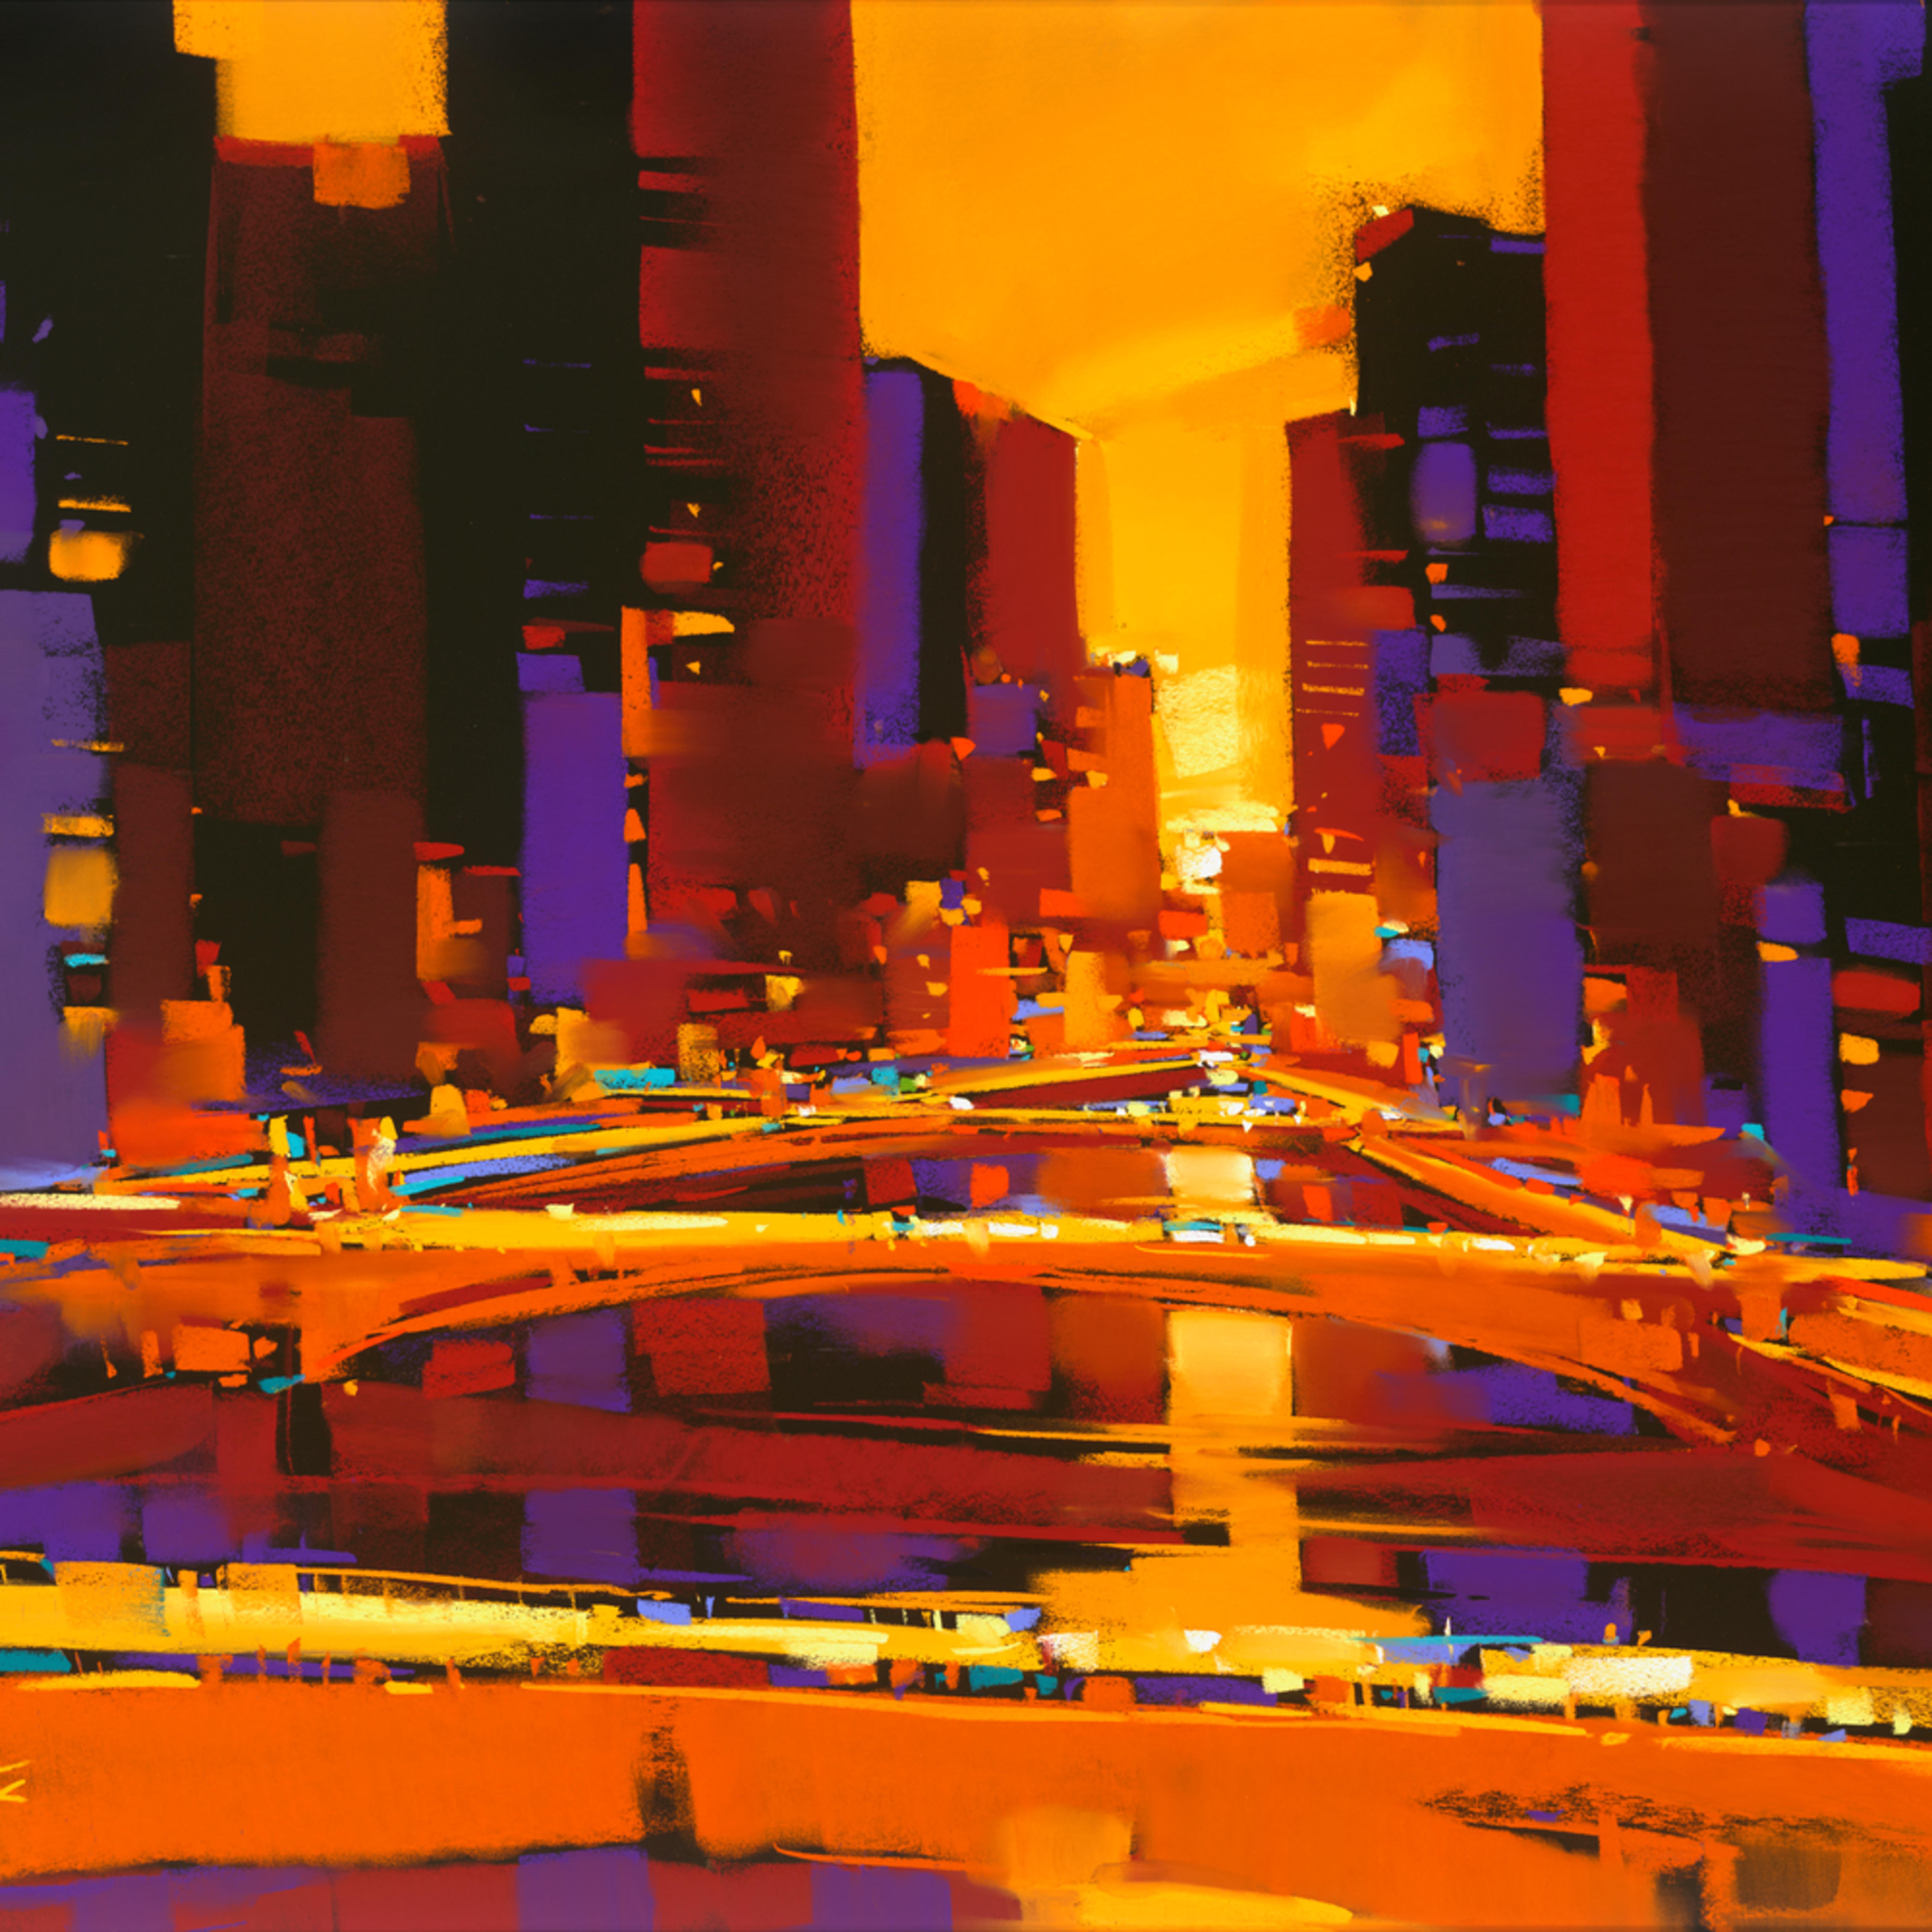 Bridges of gold b2tfwh